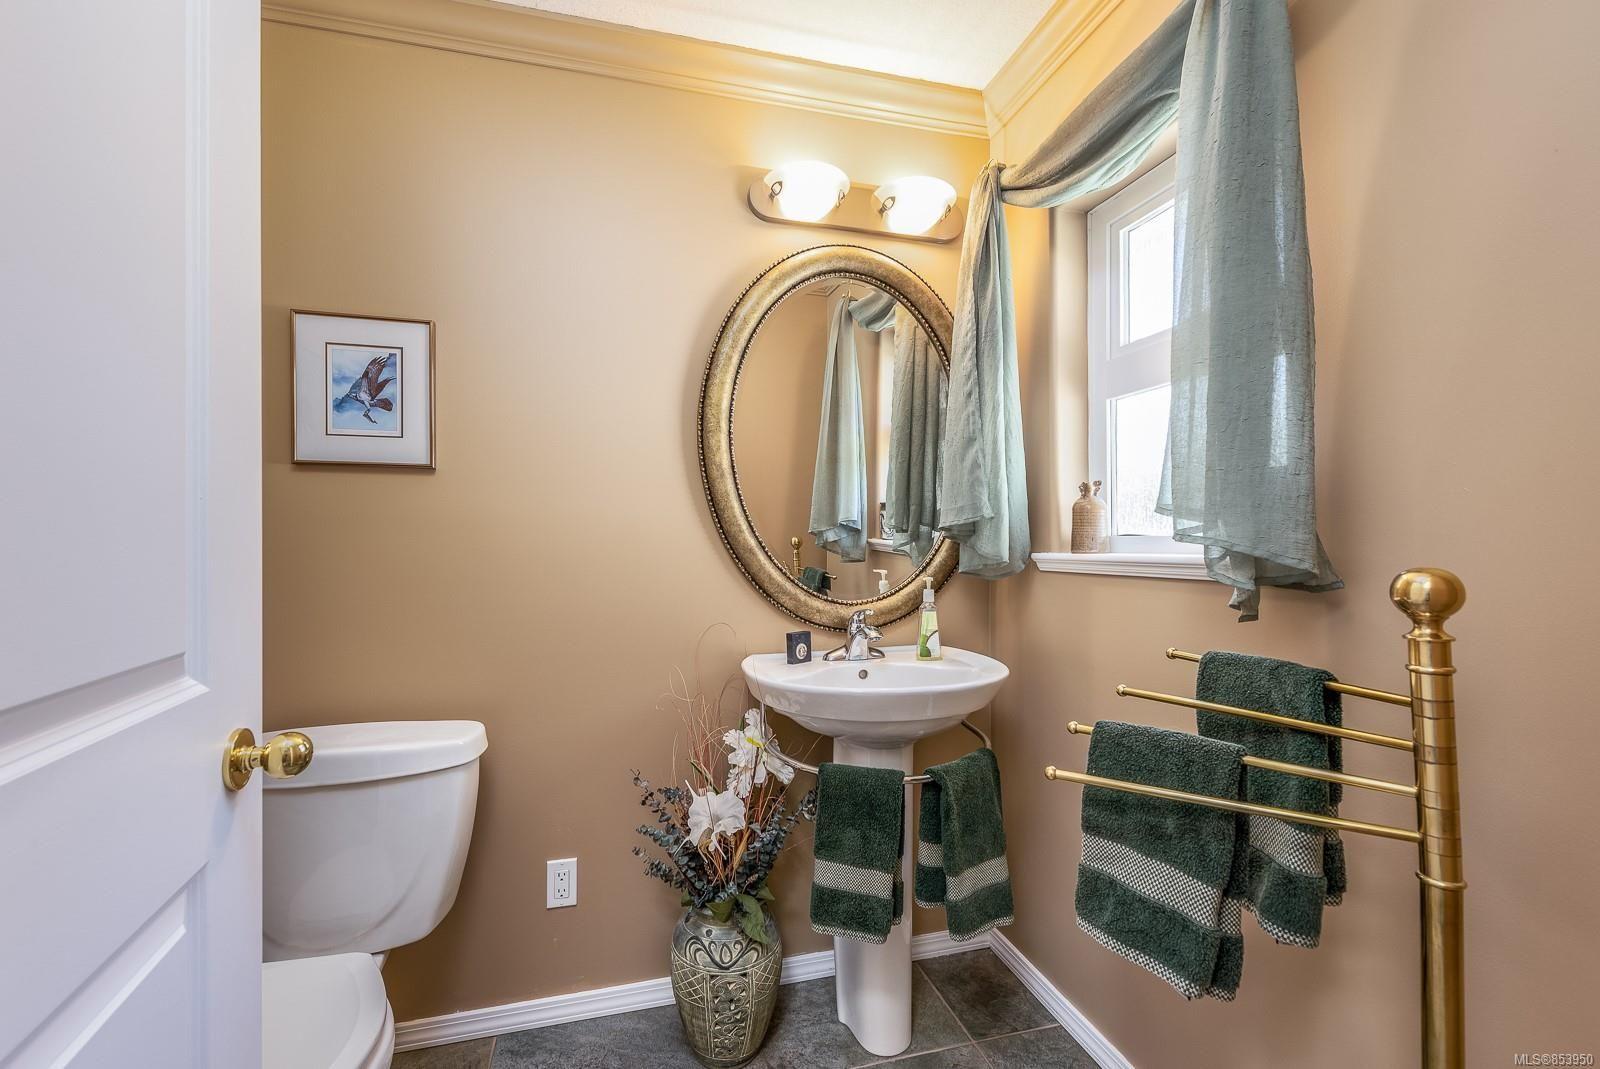 Photo 27: Photos: 5880 GARVIN Rd in : CV Union Bay/Fanny Bay House for sale (Comox Valley)  : MLS®# 853950